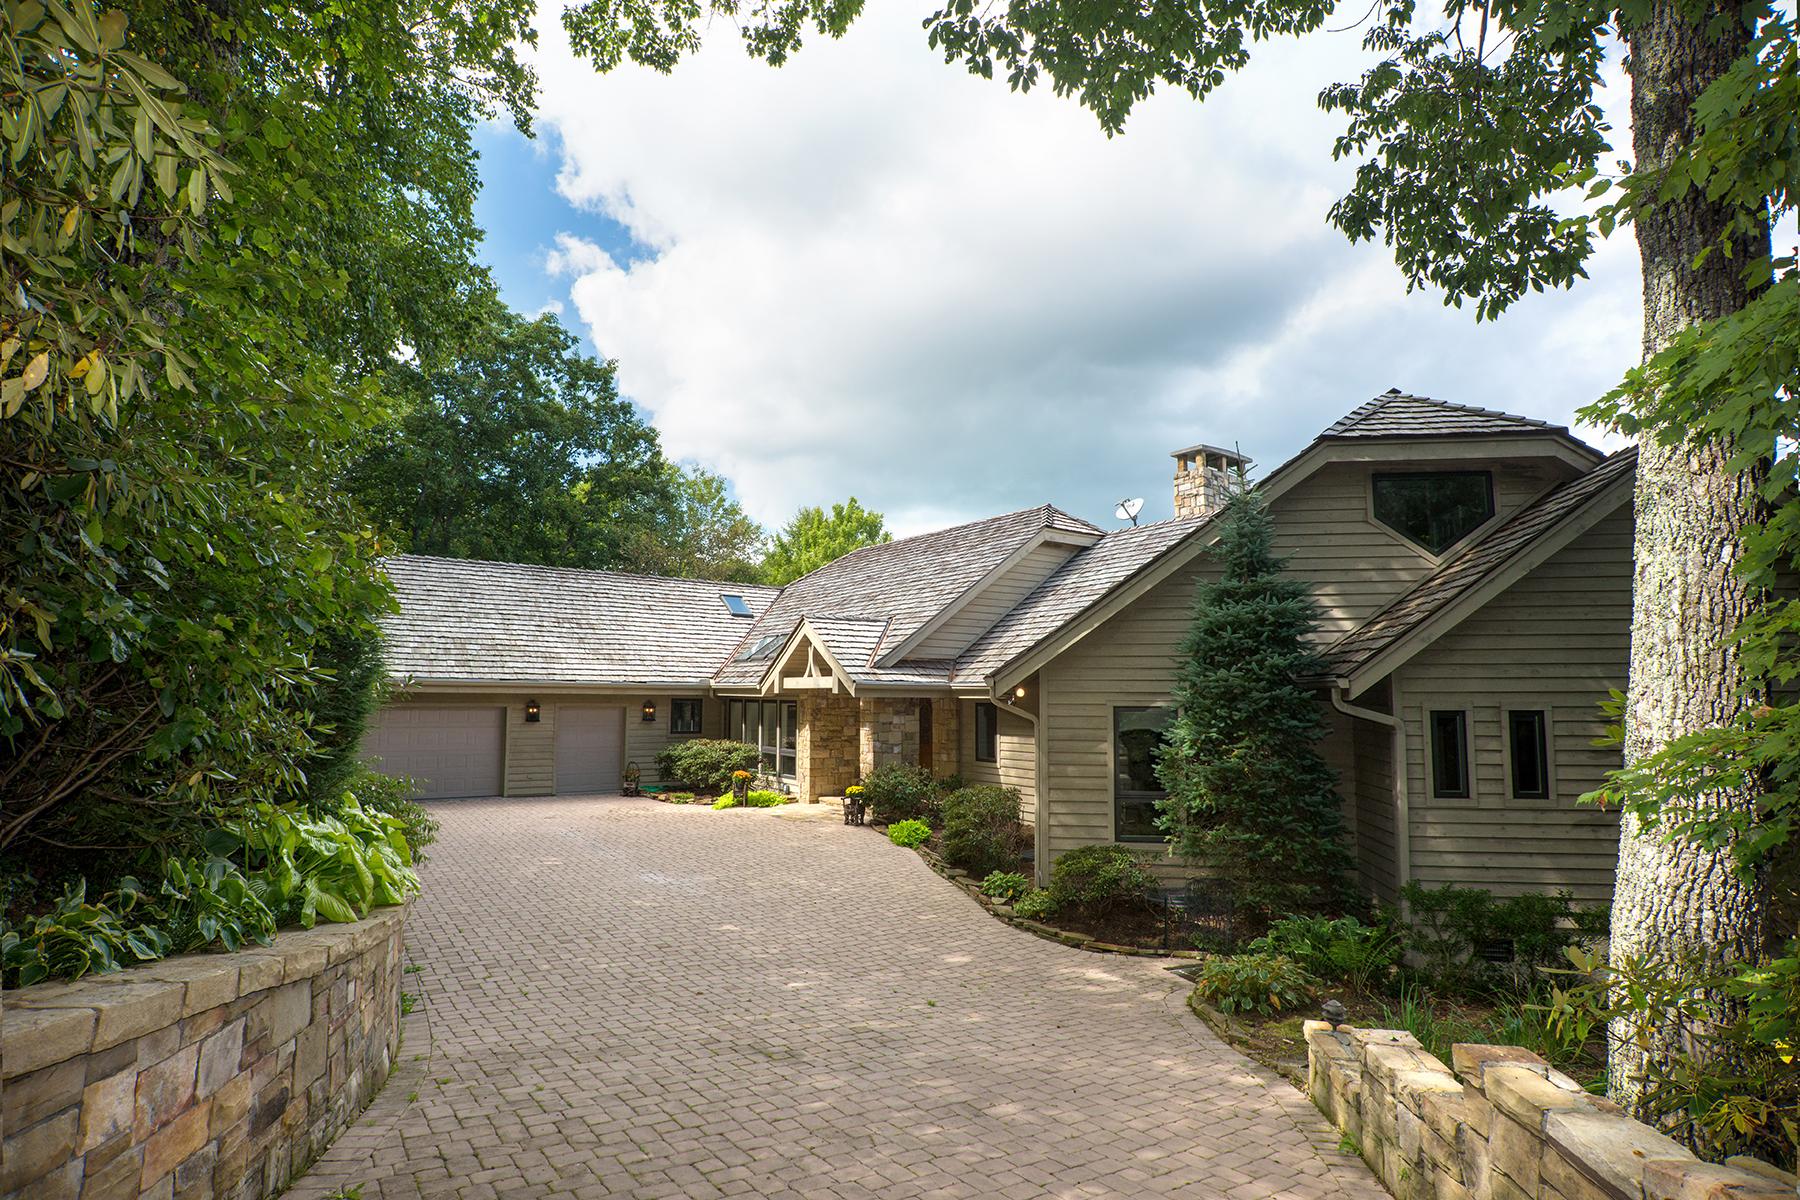 獨棟家庭住宅 為 出售 在 498 Wren Way, Banner Elk, NC 28604 498 Wren Way Banner Elk, 北卡羅來納州 28604 美國